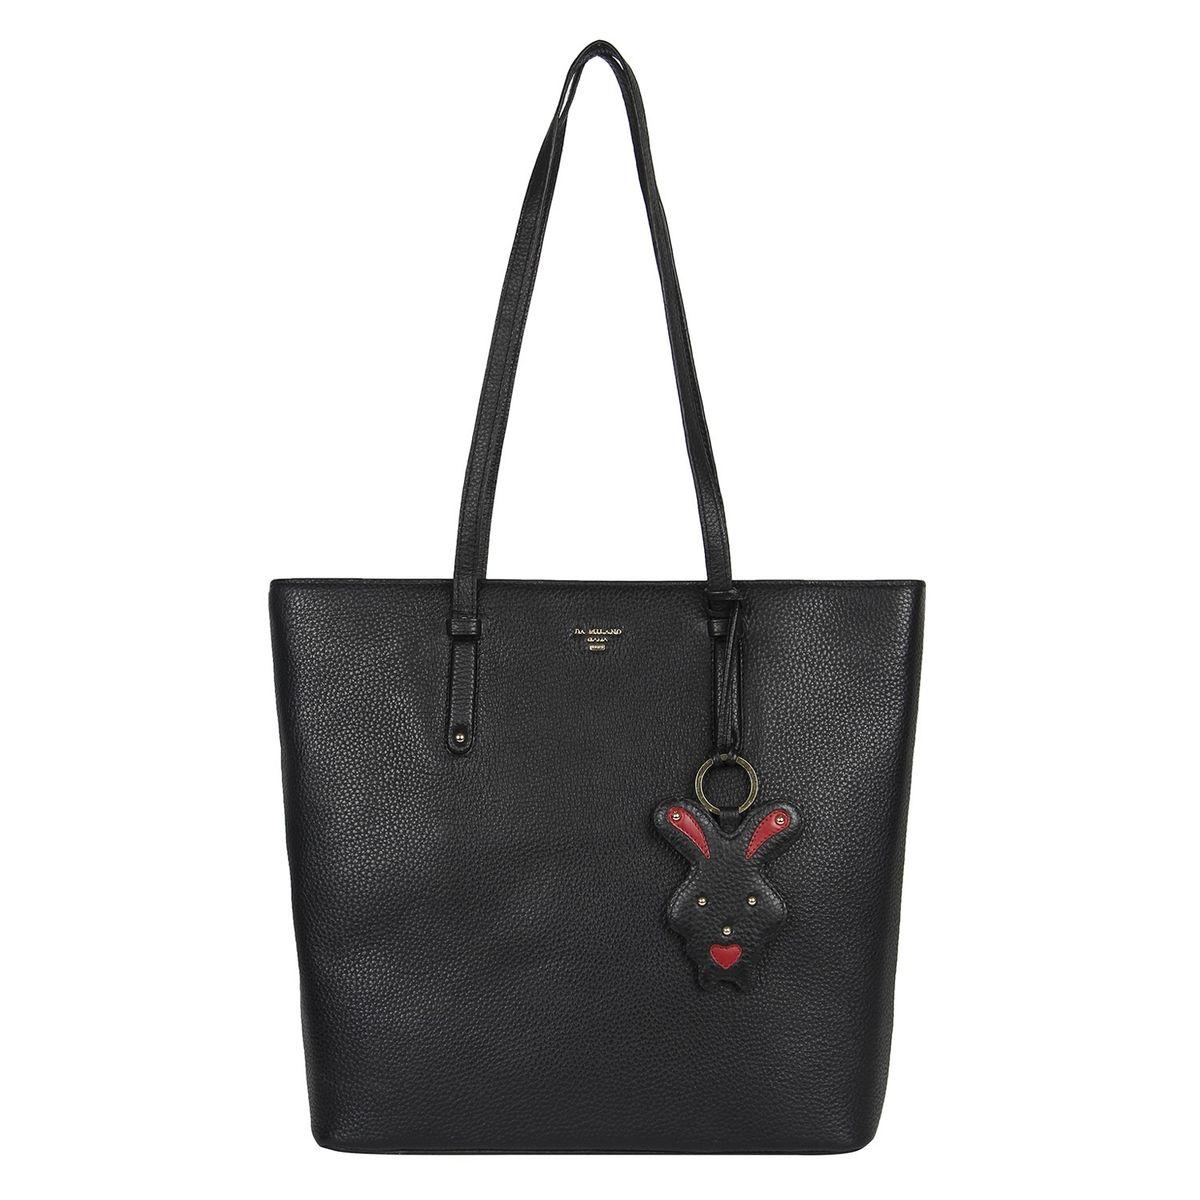 Da Milano Black Shopper Bag Lb 4215blackwax